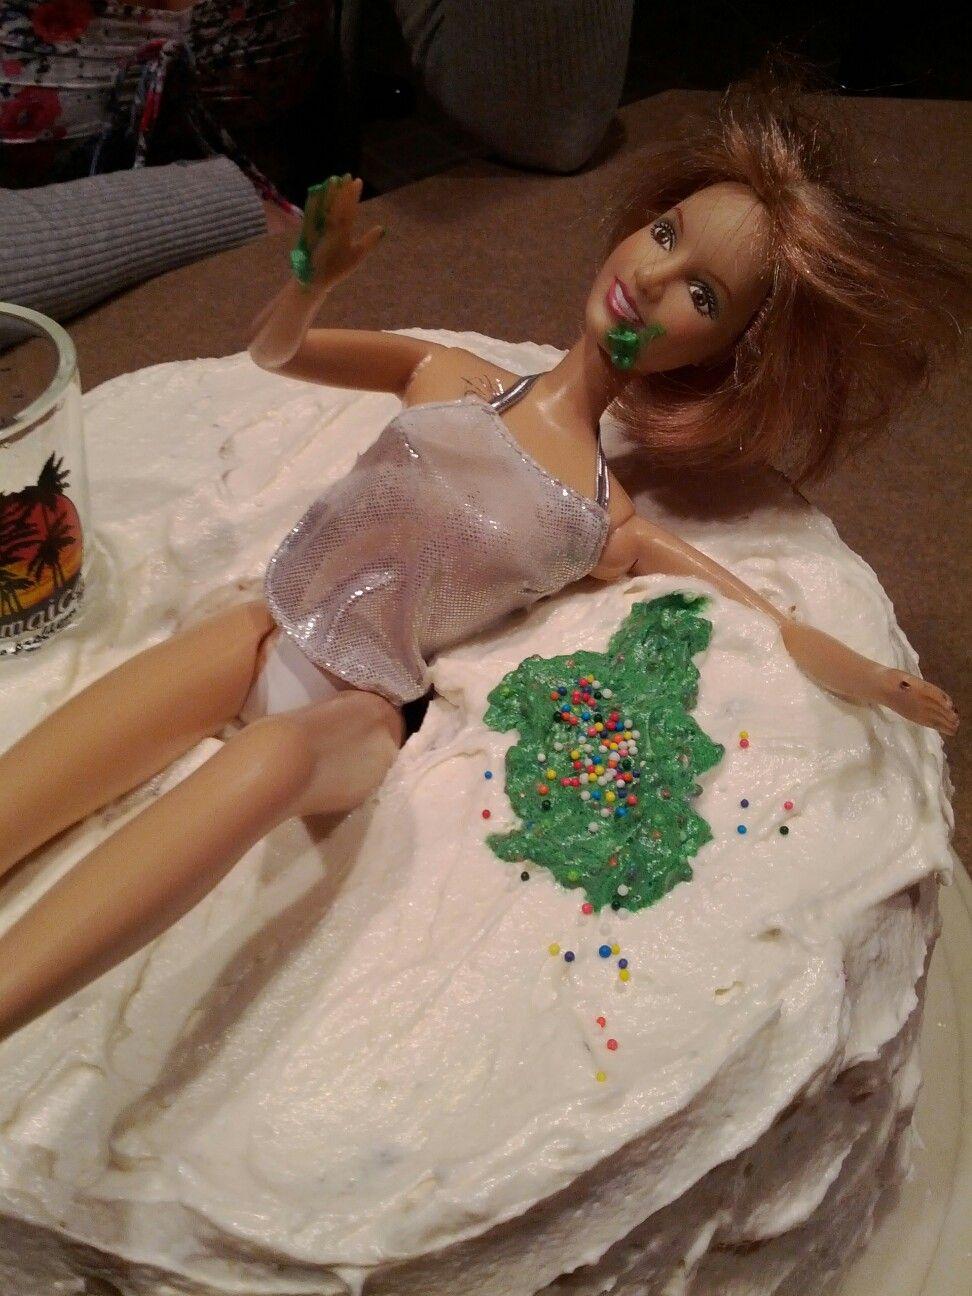 Drunk barbie cake cake ideas and designs